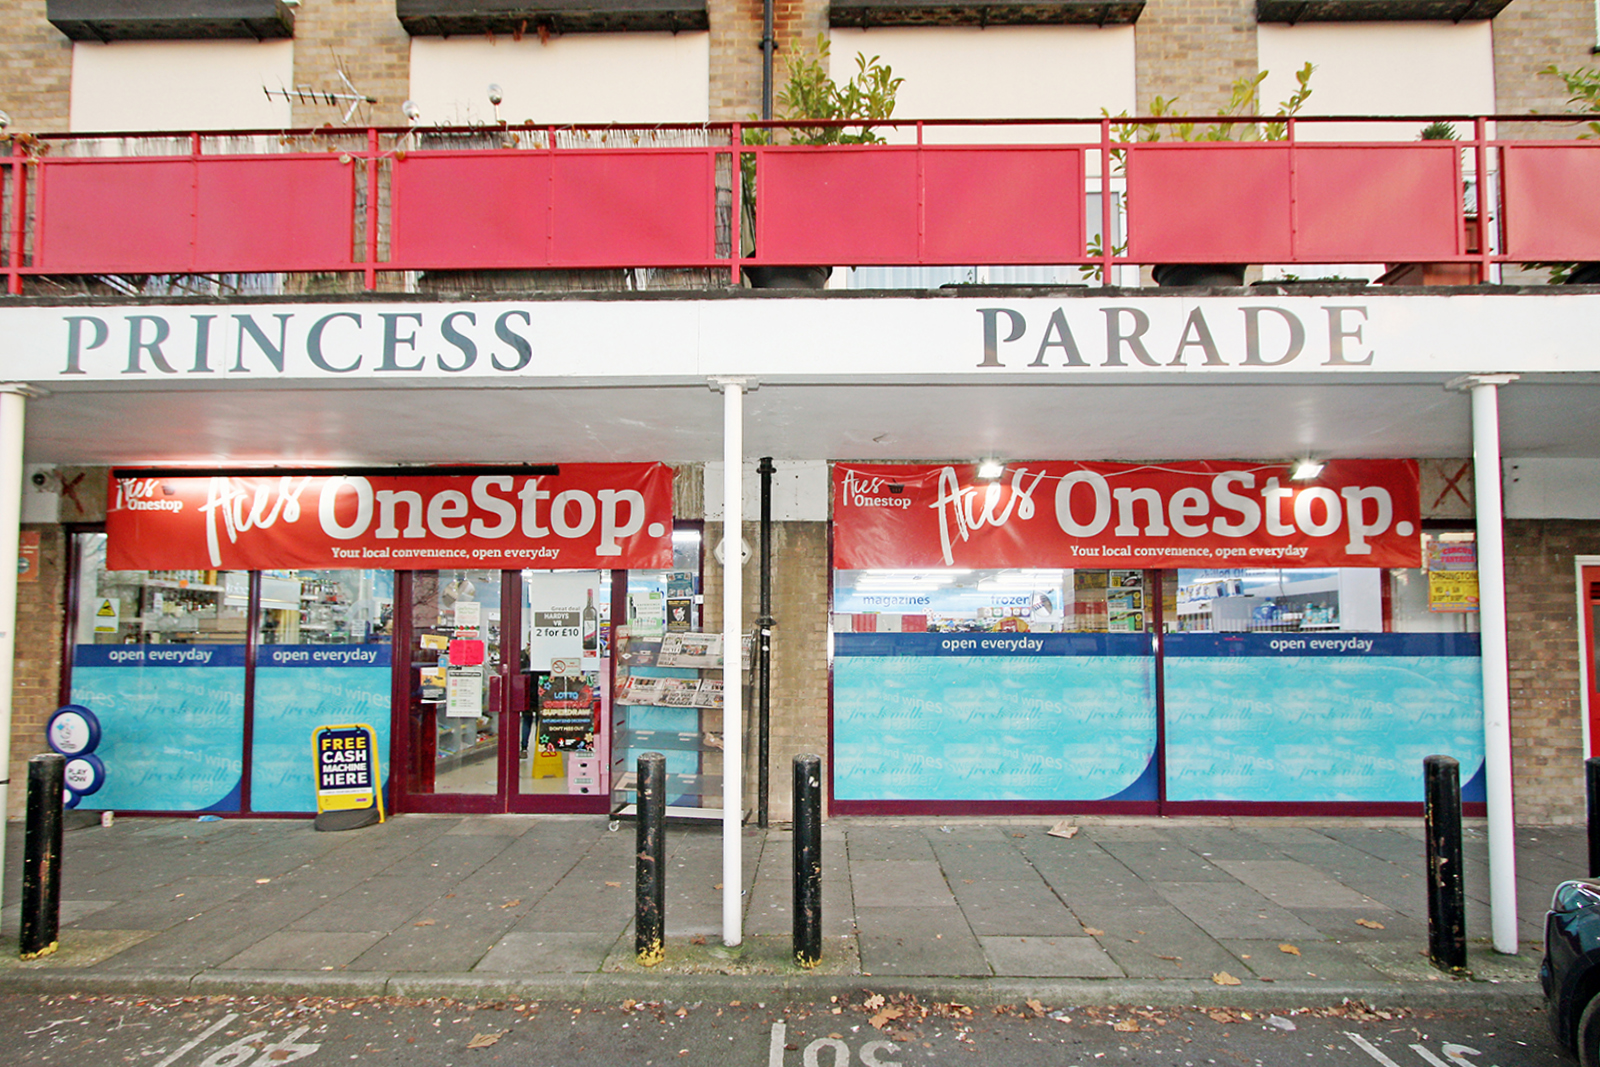 Photo 9, Princess Parade, Crofton Road, BR6